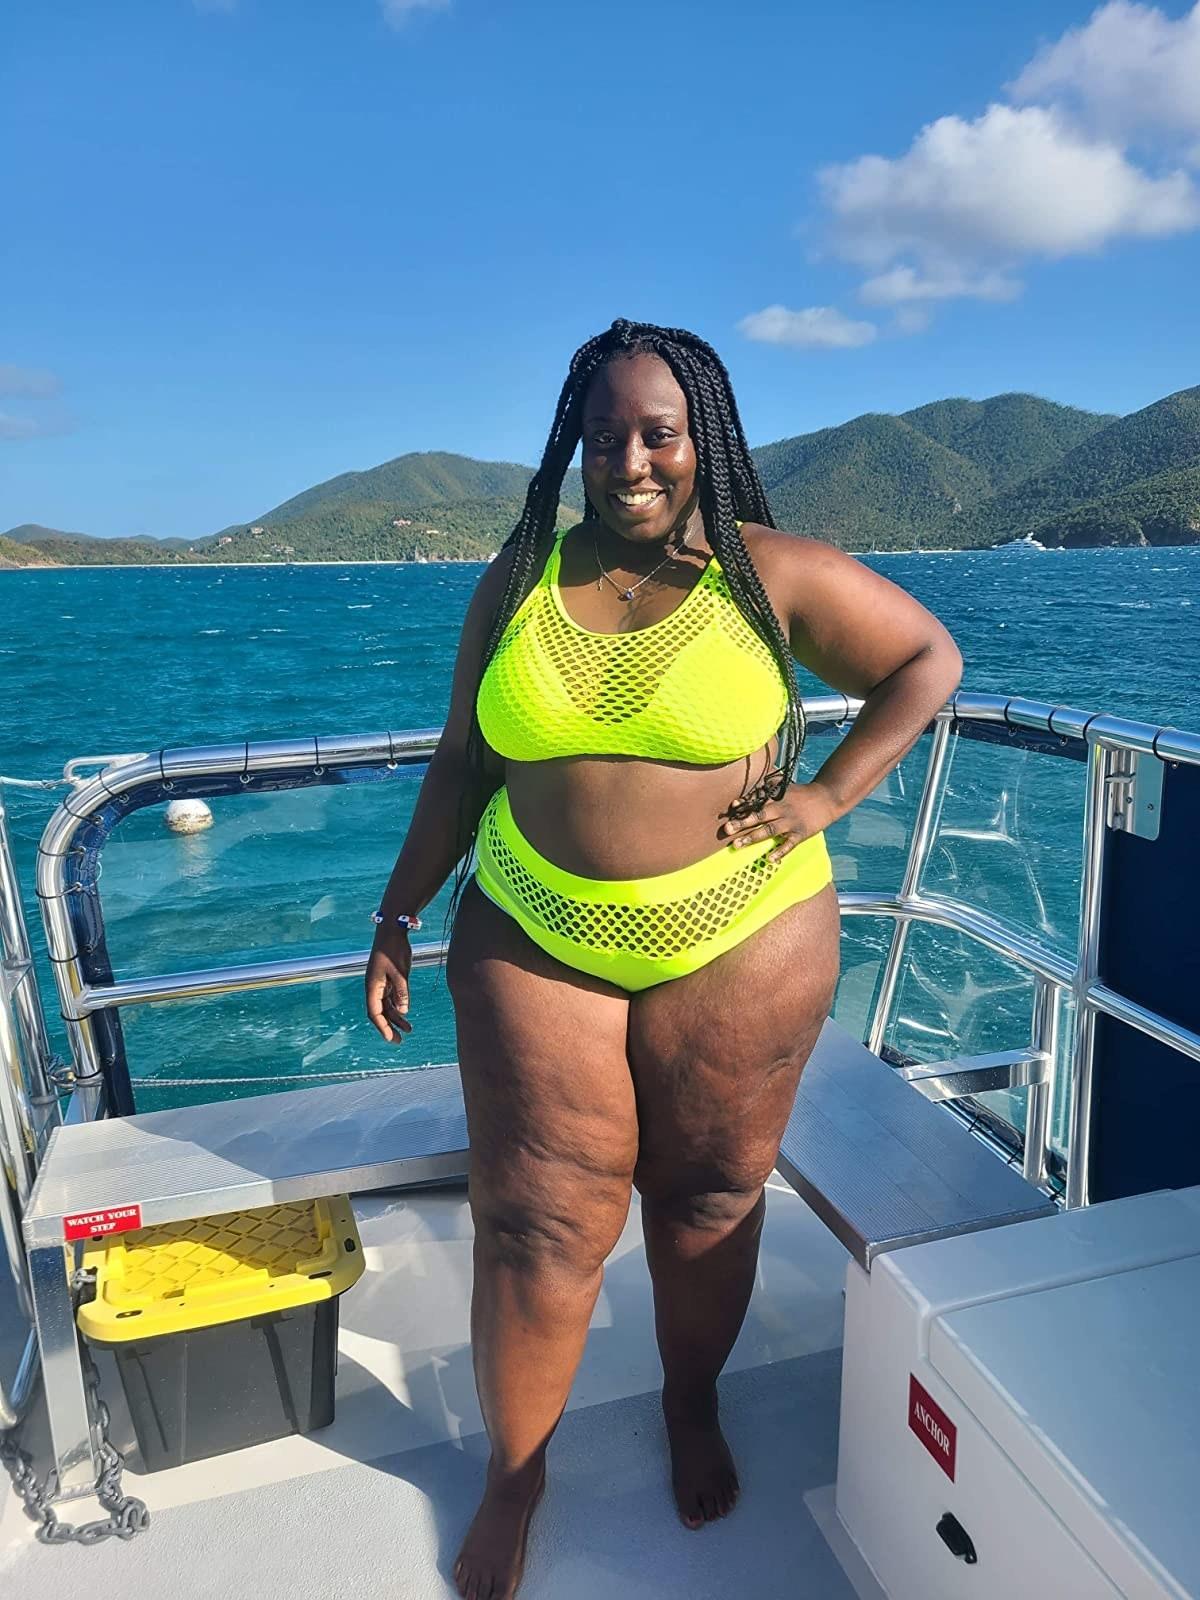 mesh bikini with full coverage where it's needed